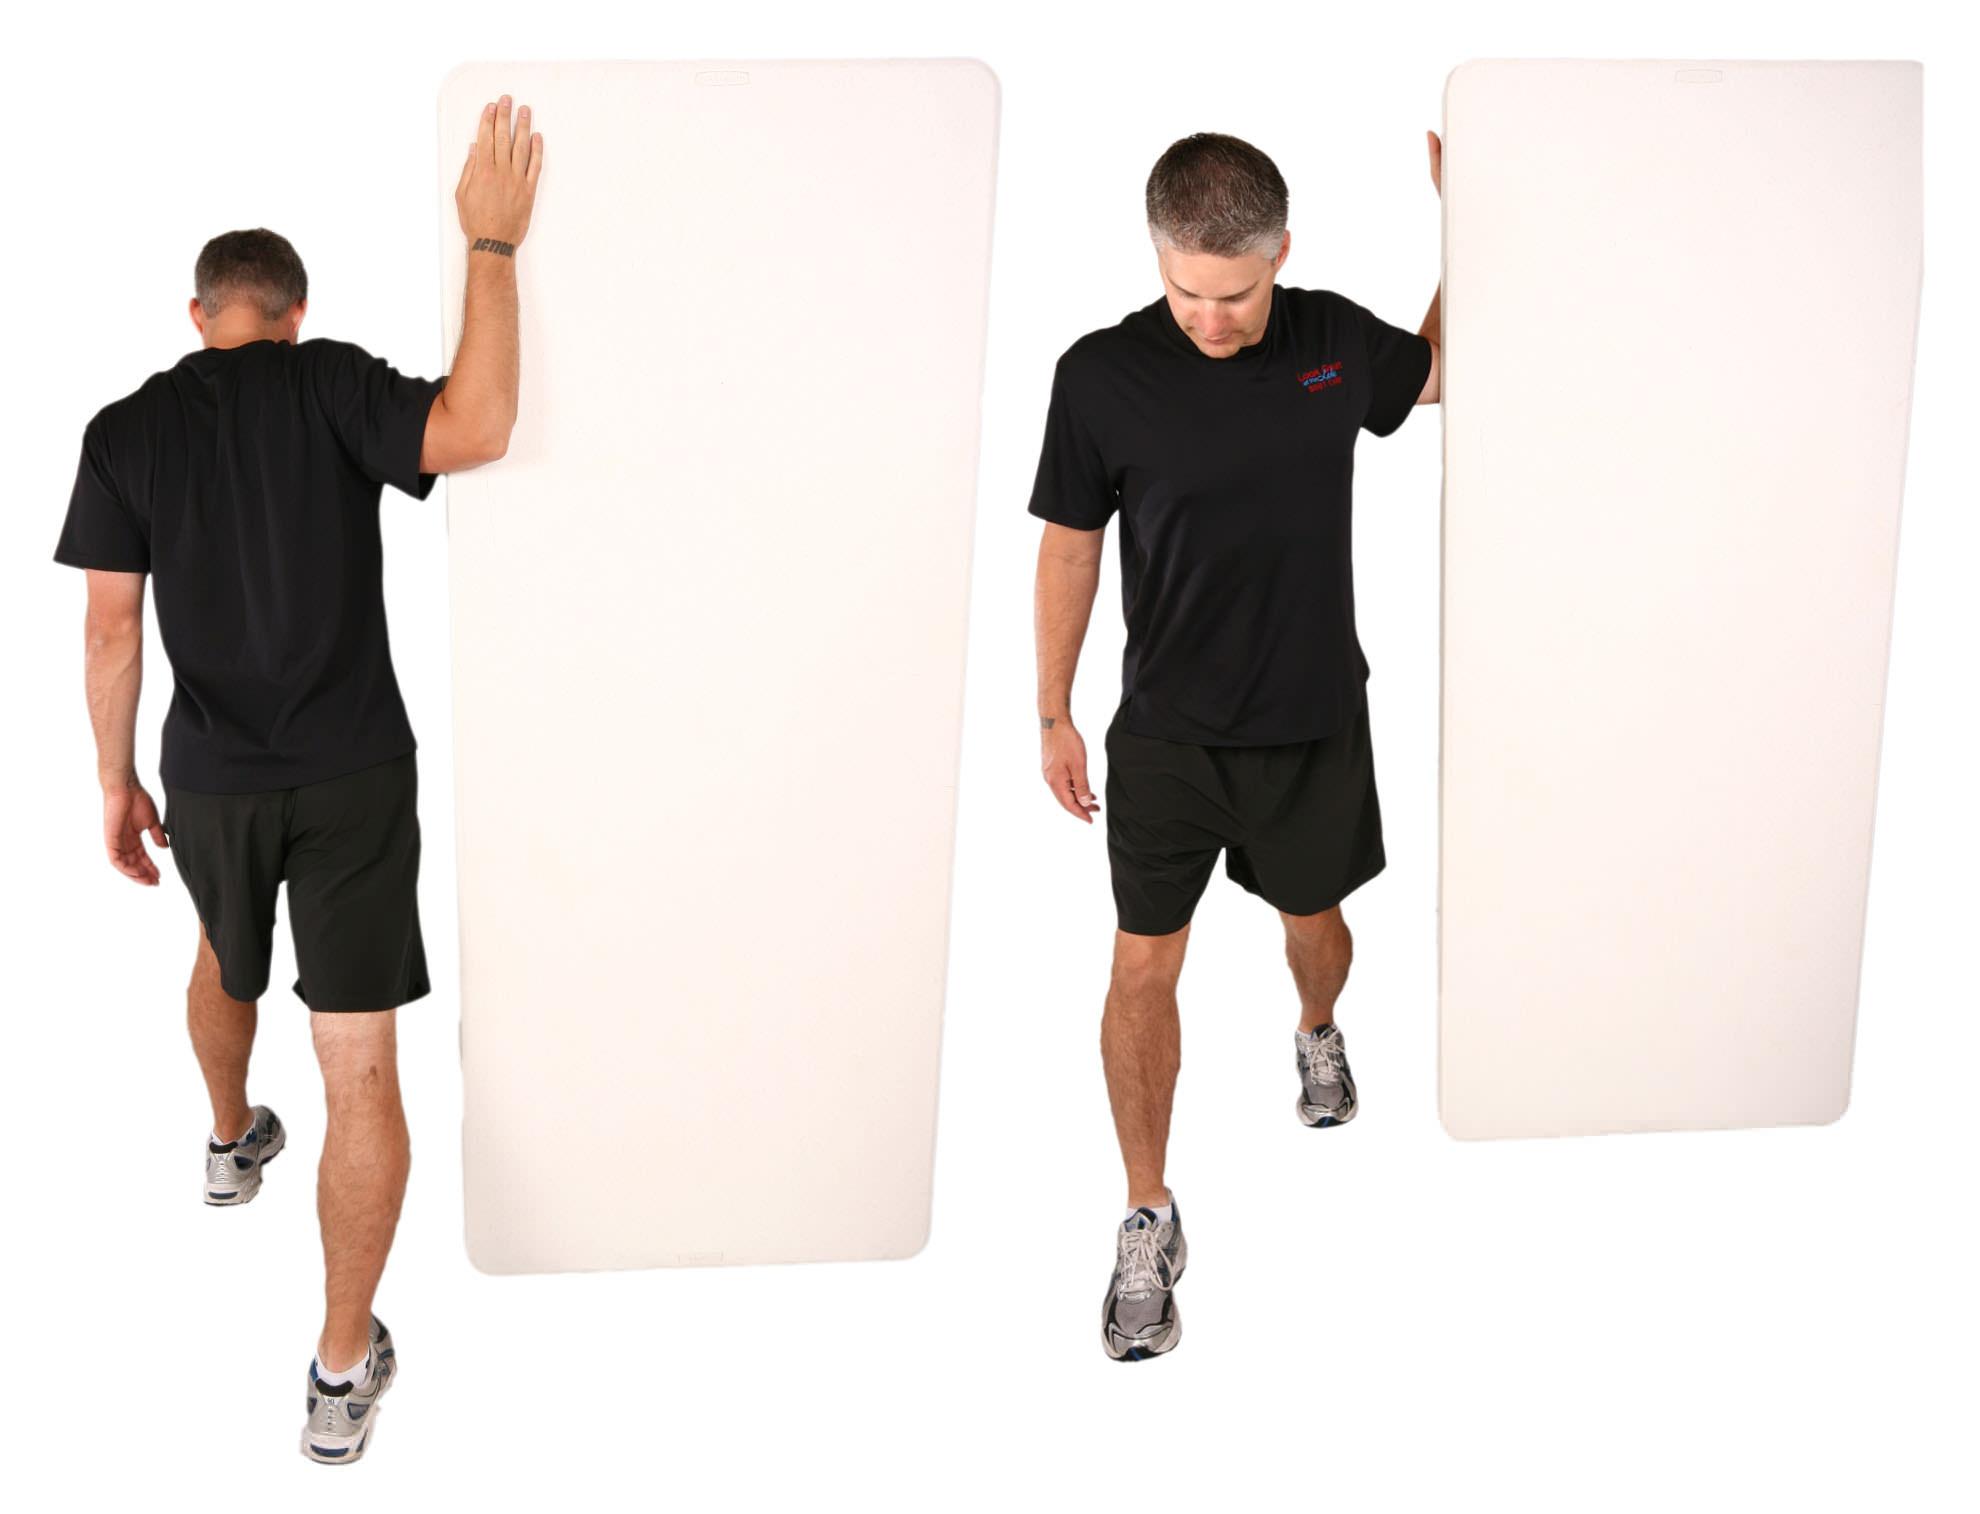 How to Improve Posture: Pectoralis Minor Stretch Toronto Chiropractor